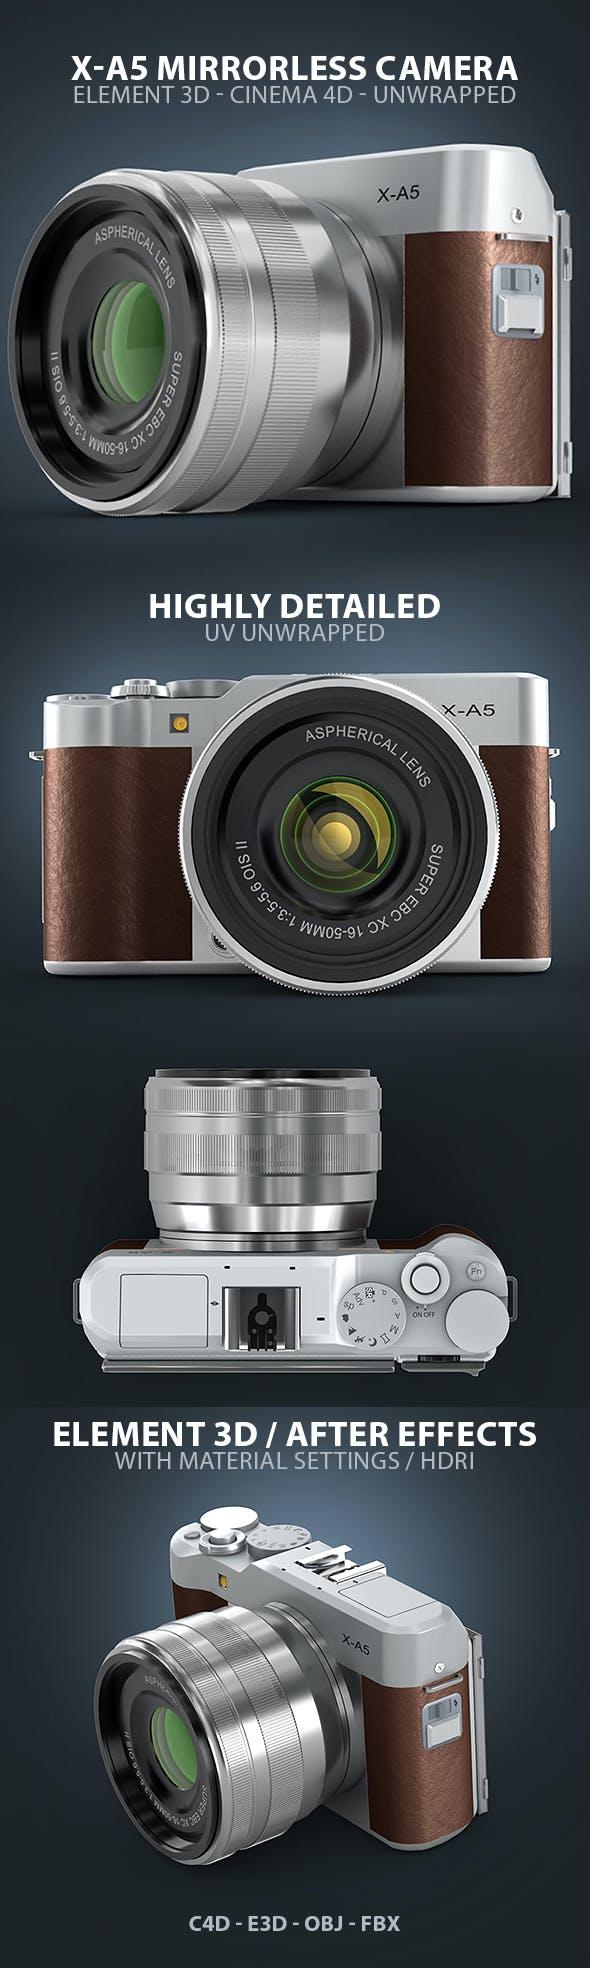 Fuji X-A5 Mirrorless Digital Camera Element 3D & Cinema 4D Model - 3DOcean Item for Sale